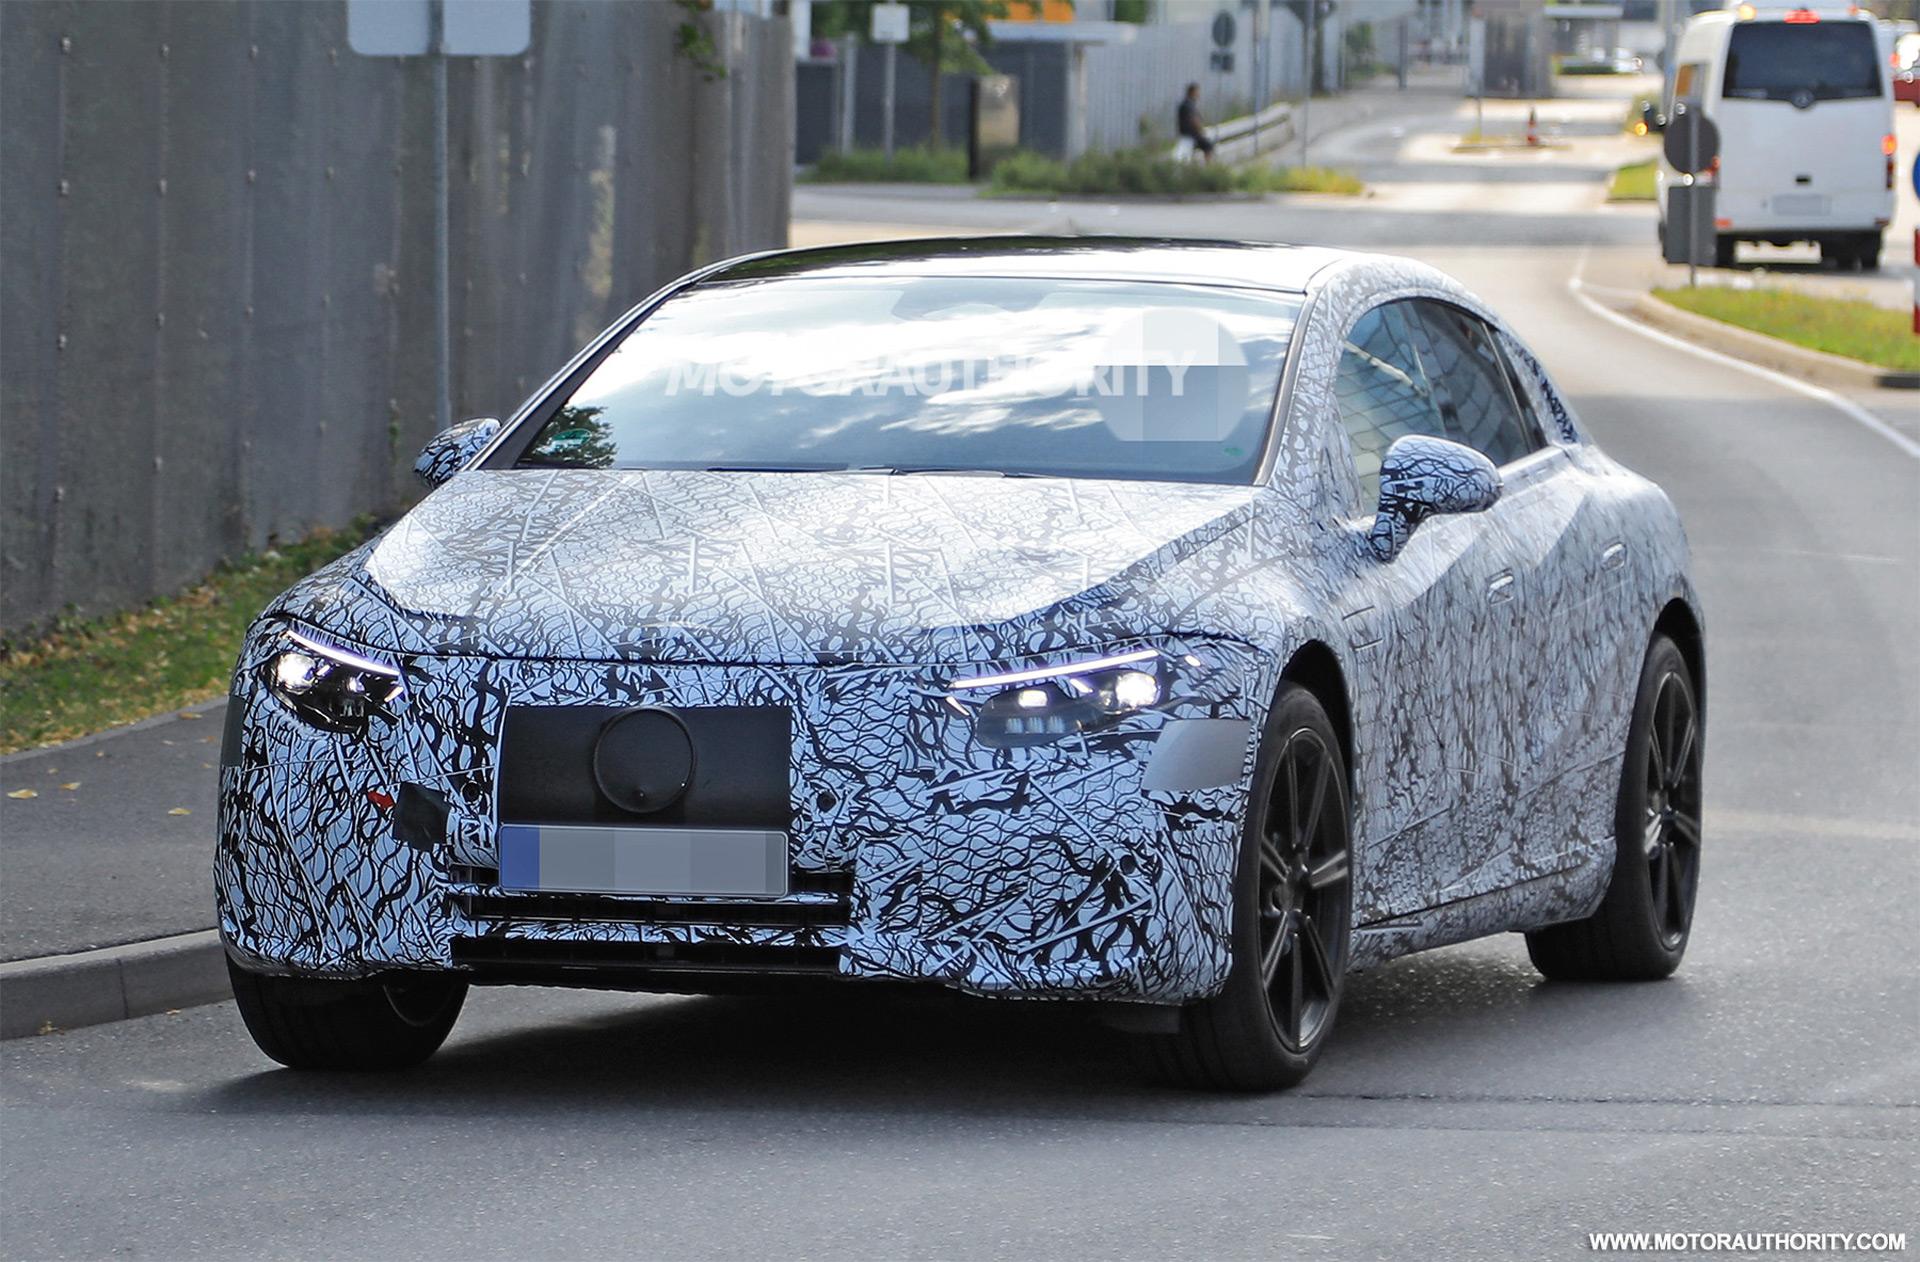 2020 - [Mercedes-Benz] EQ S - Page 4 2021-mercedes-benz-eqs-spy-shots--photo-credits-baldauf-sb-medien_100753403_h